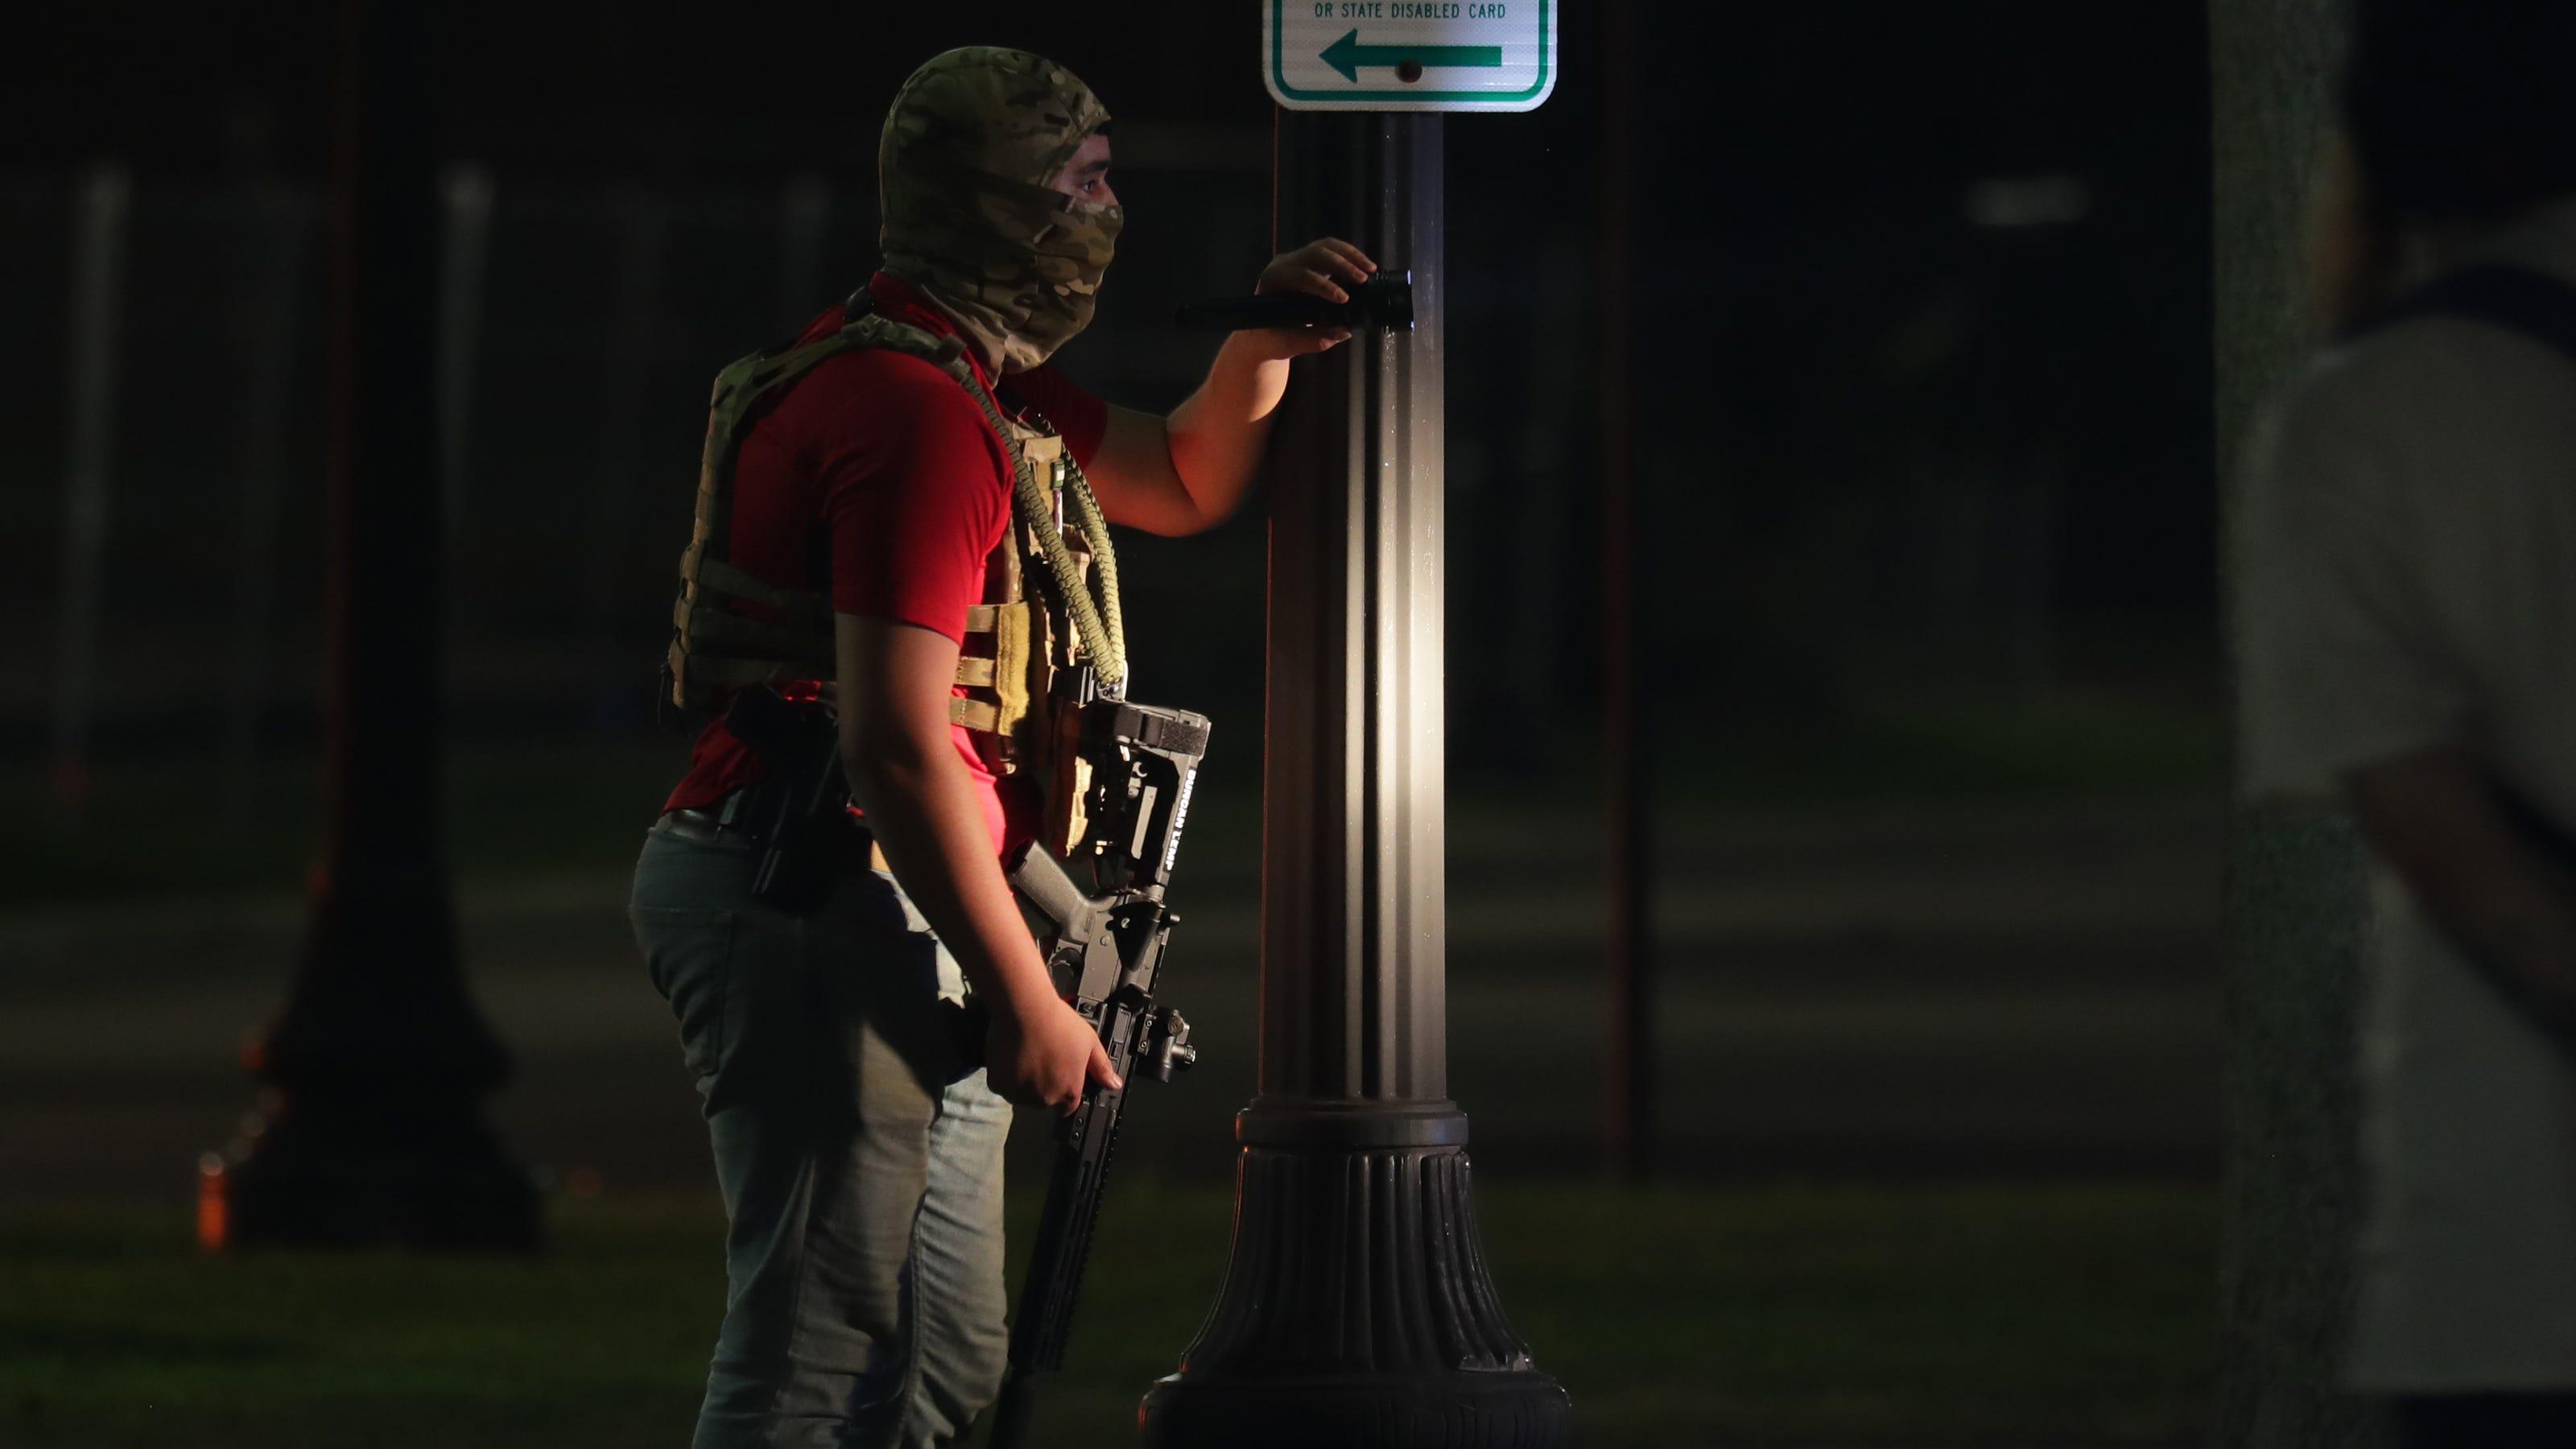 considered Kenosha Rittenhouse, Kyle Suspect  shooting: